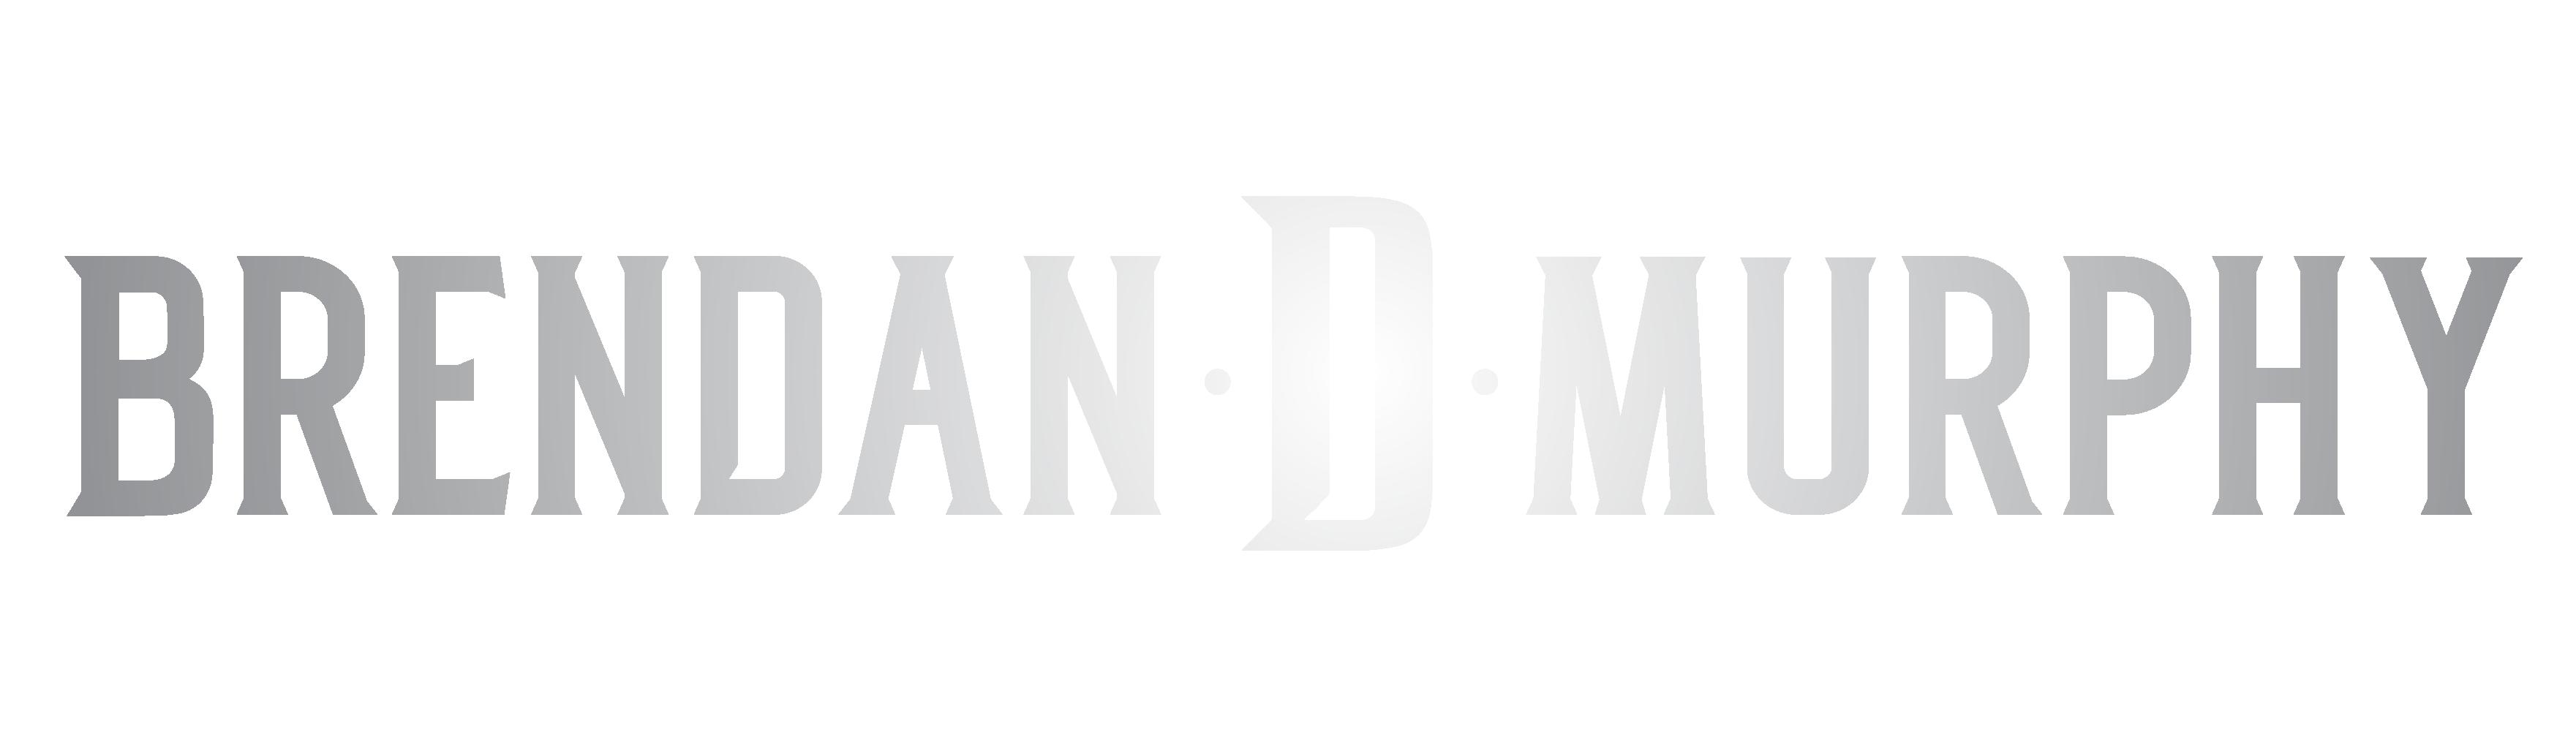 7svme68pt8ujyjdgwnn4 bdm001 logo primary lightgradient